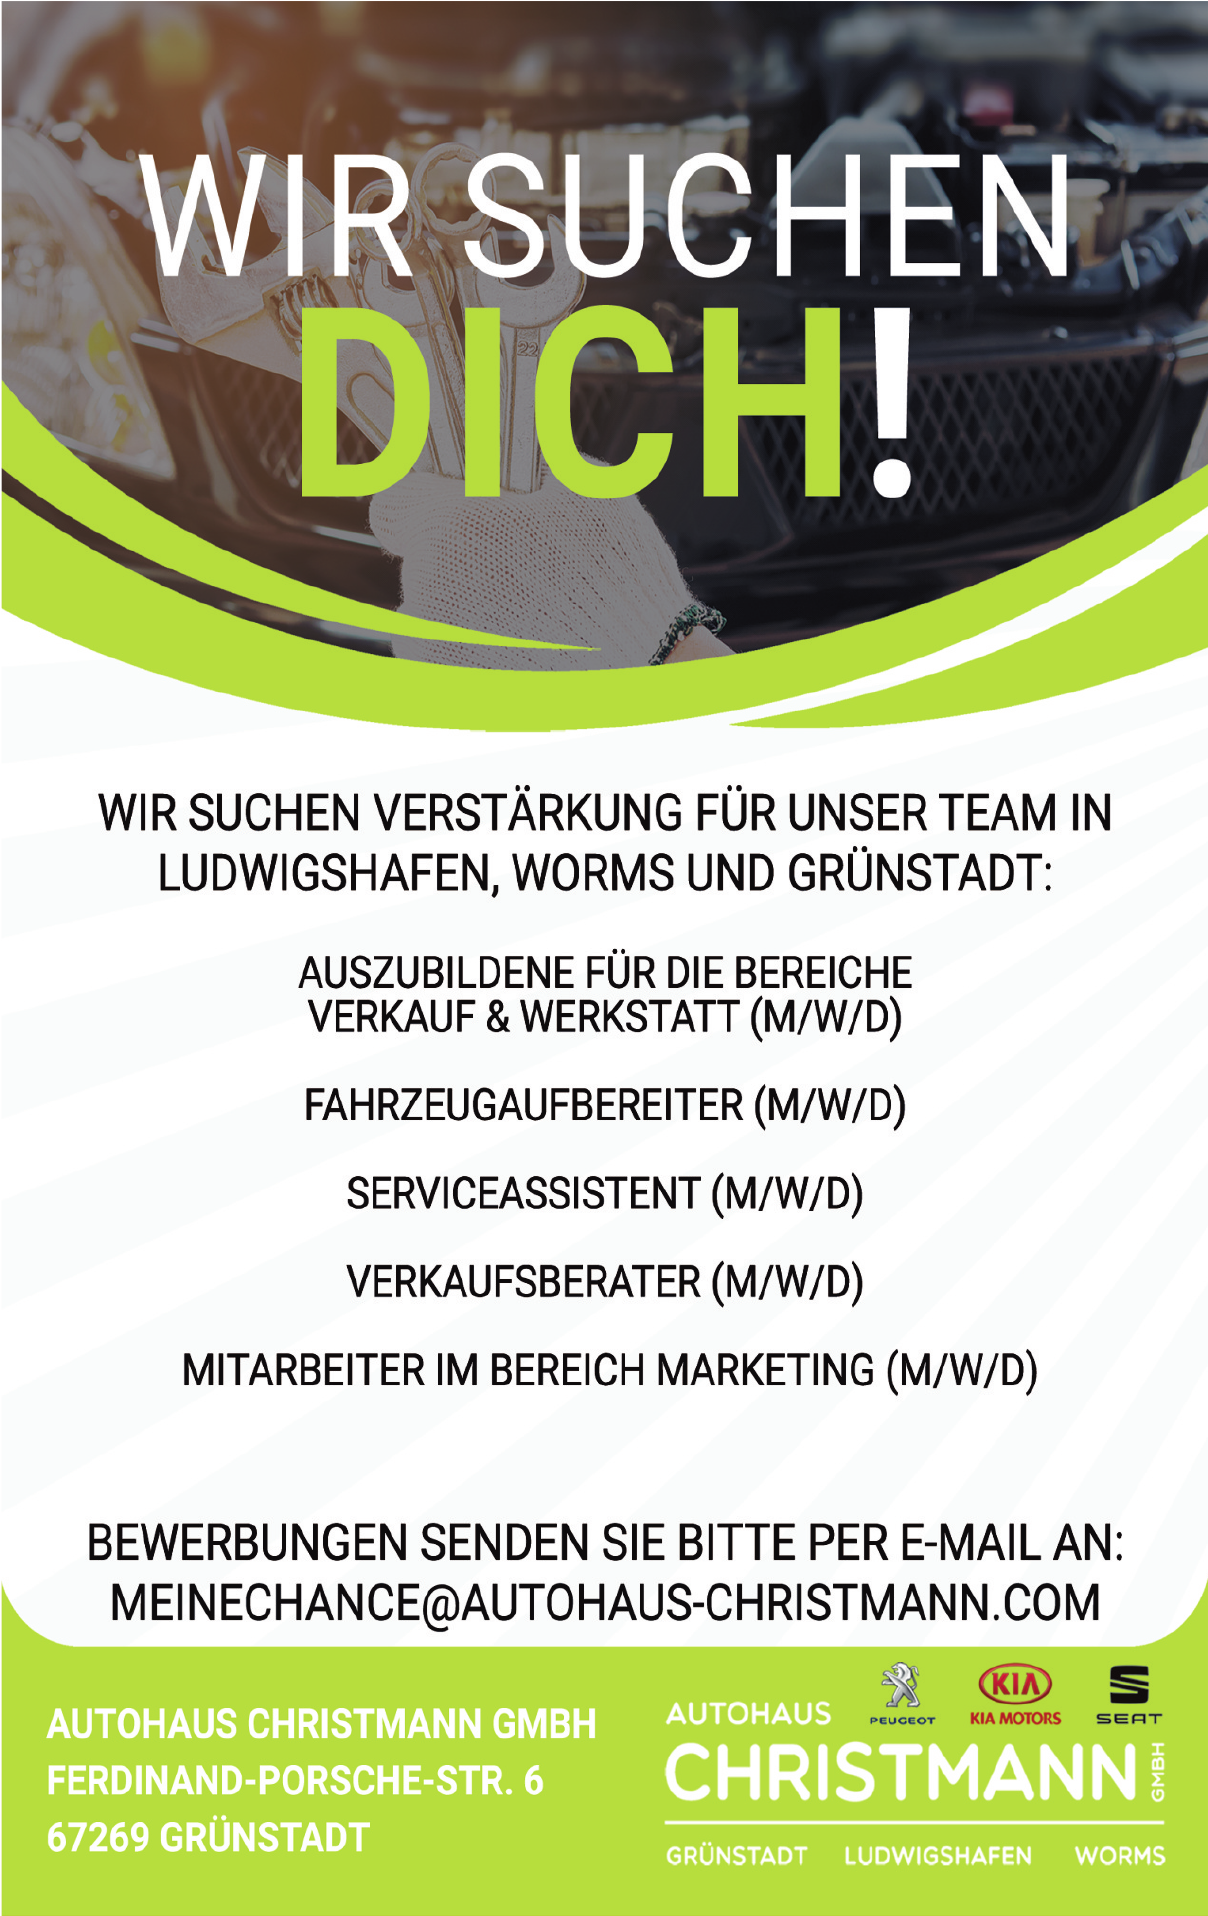 Autohaus Christmann GmbH